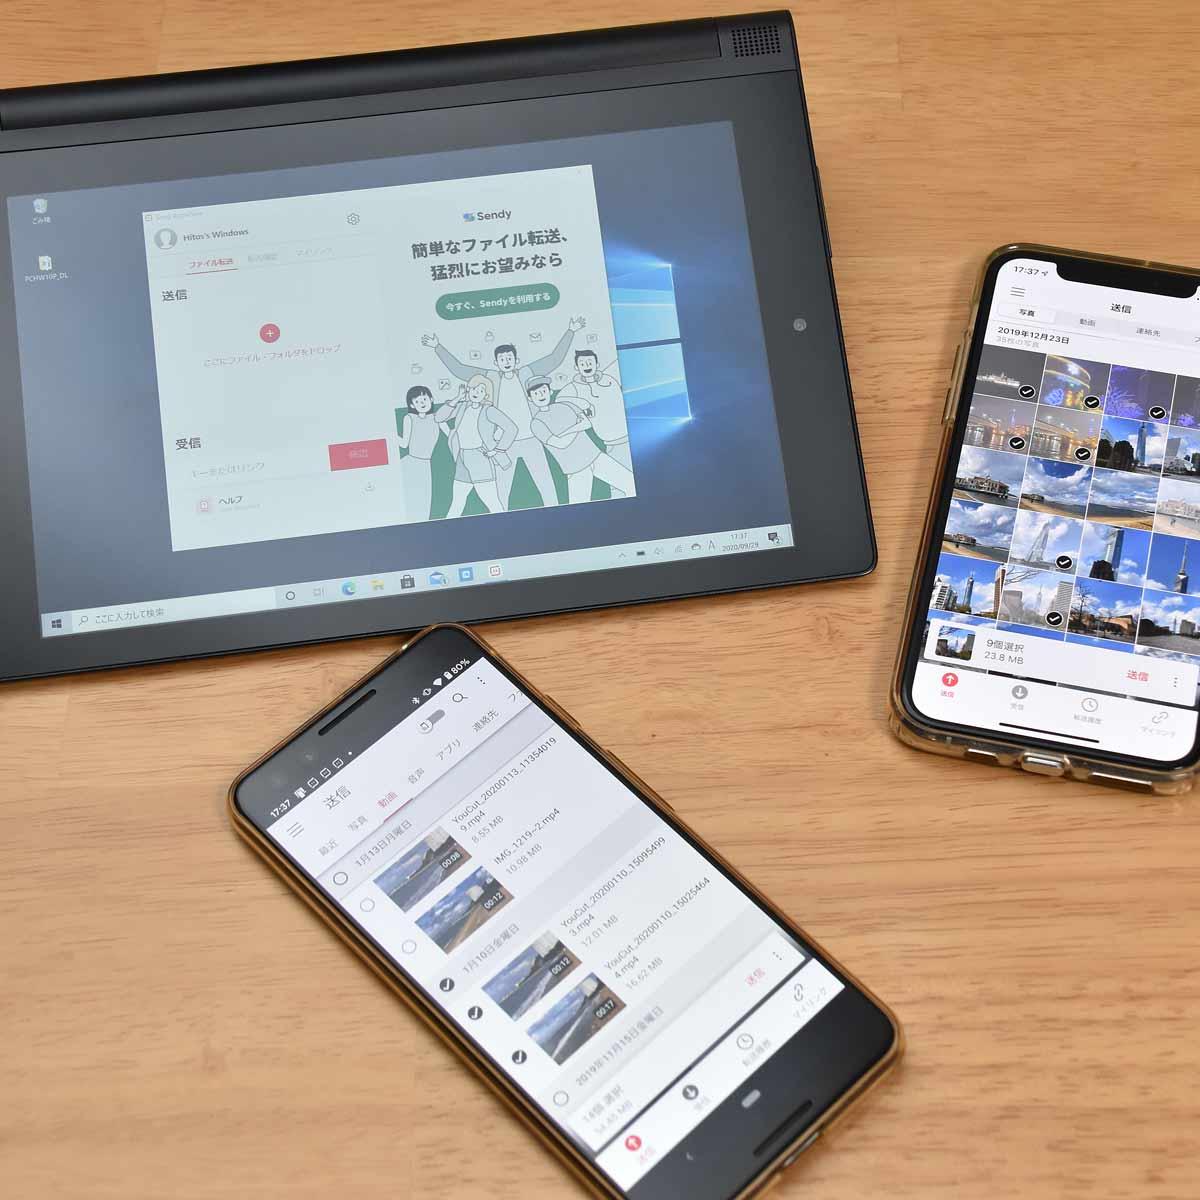 iPhone/iPadとAndroid端末間で手軽にデータをやり取りする方法